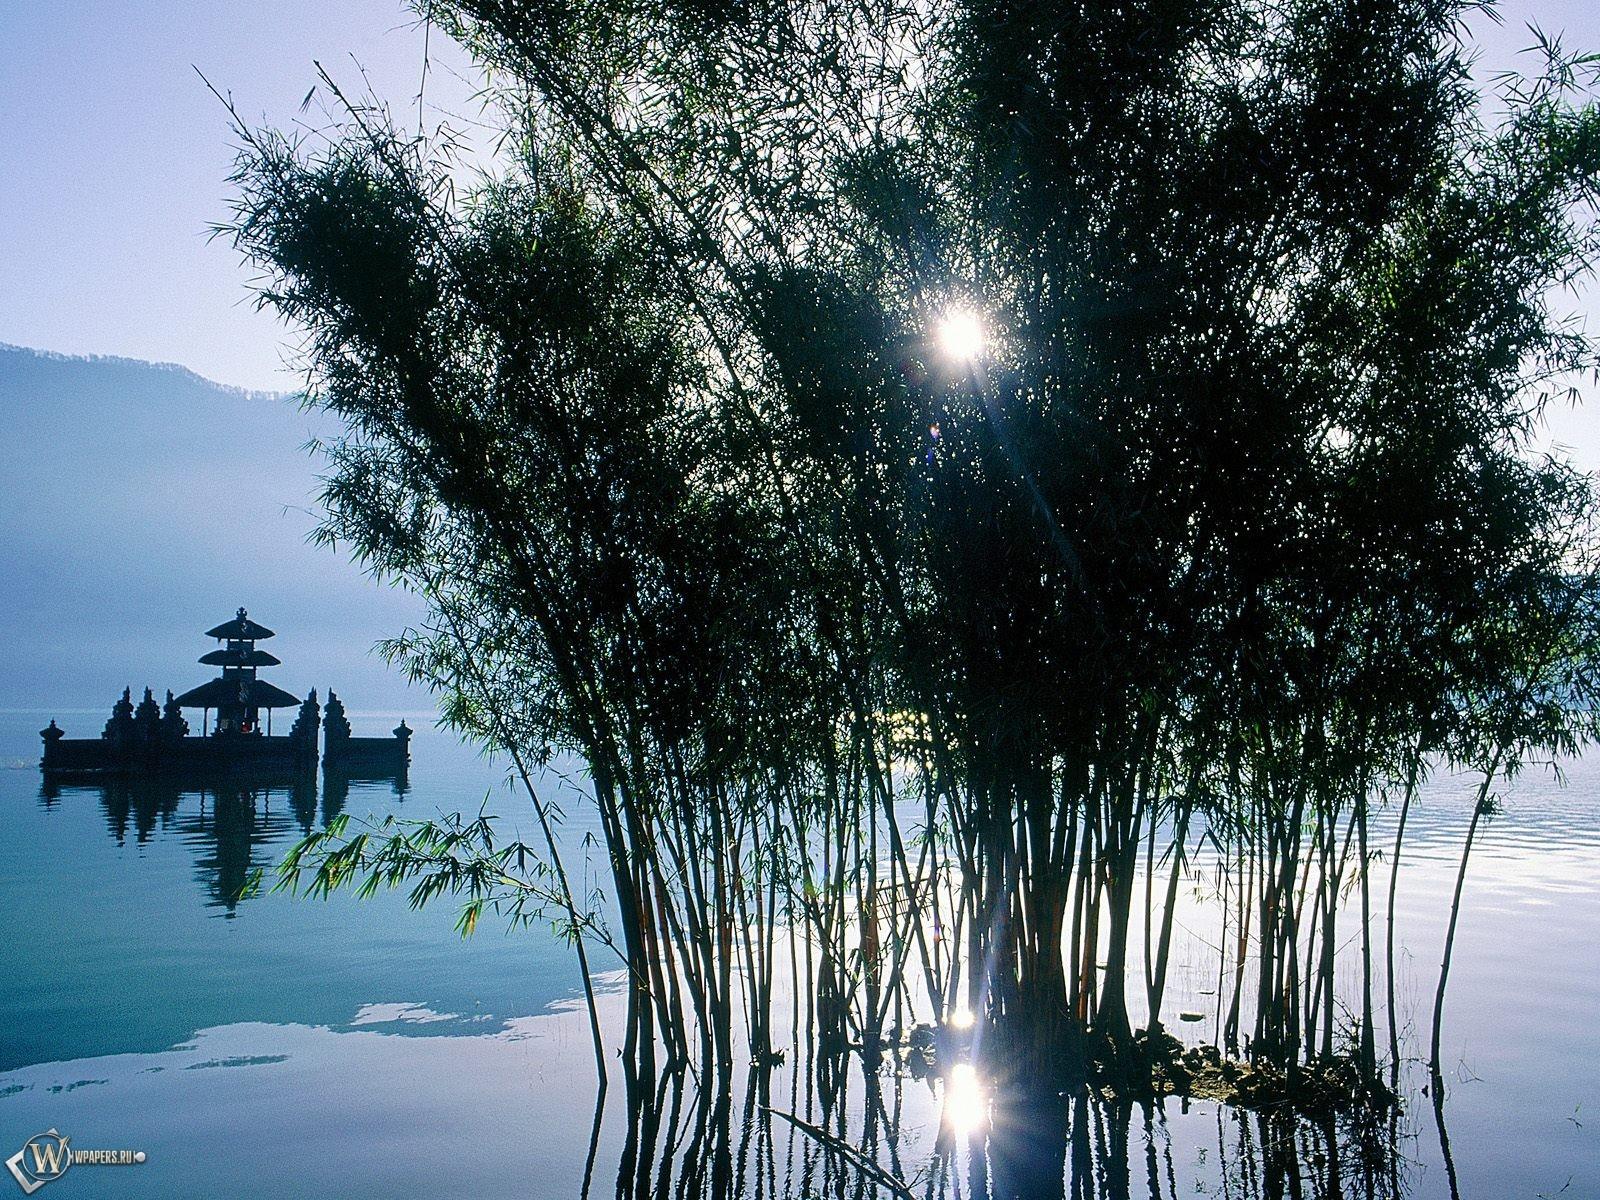 Солнце за кустарником в воде 1600x1200